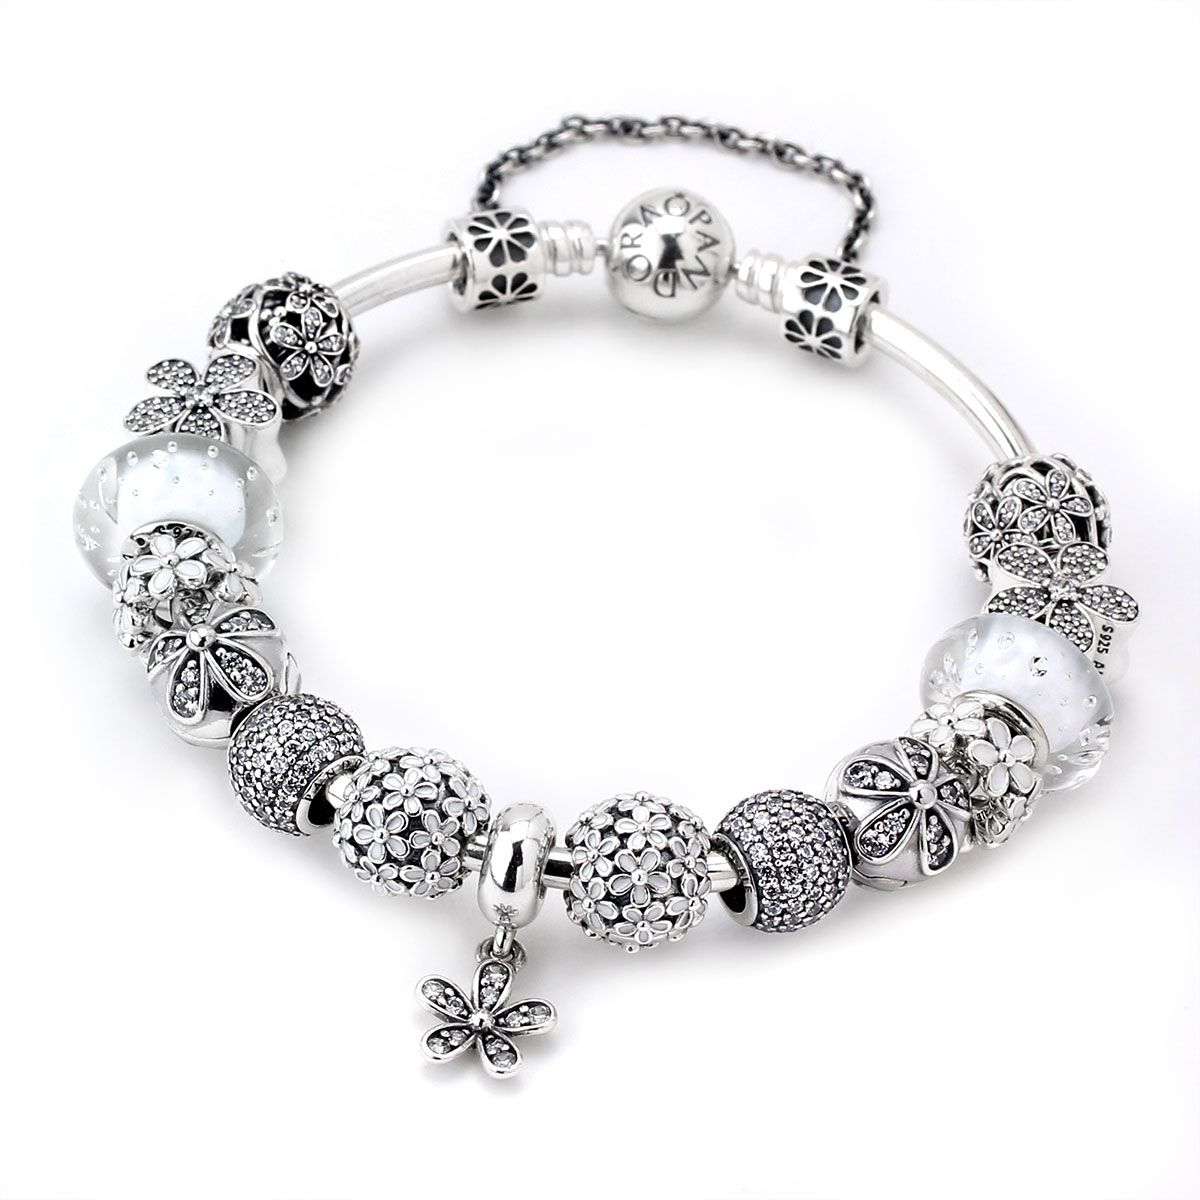 85e0ff66a PANDORA Upsy Daisy Charm Bracelet - Time for sundresses and ...